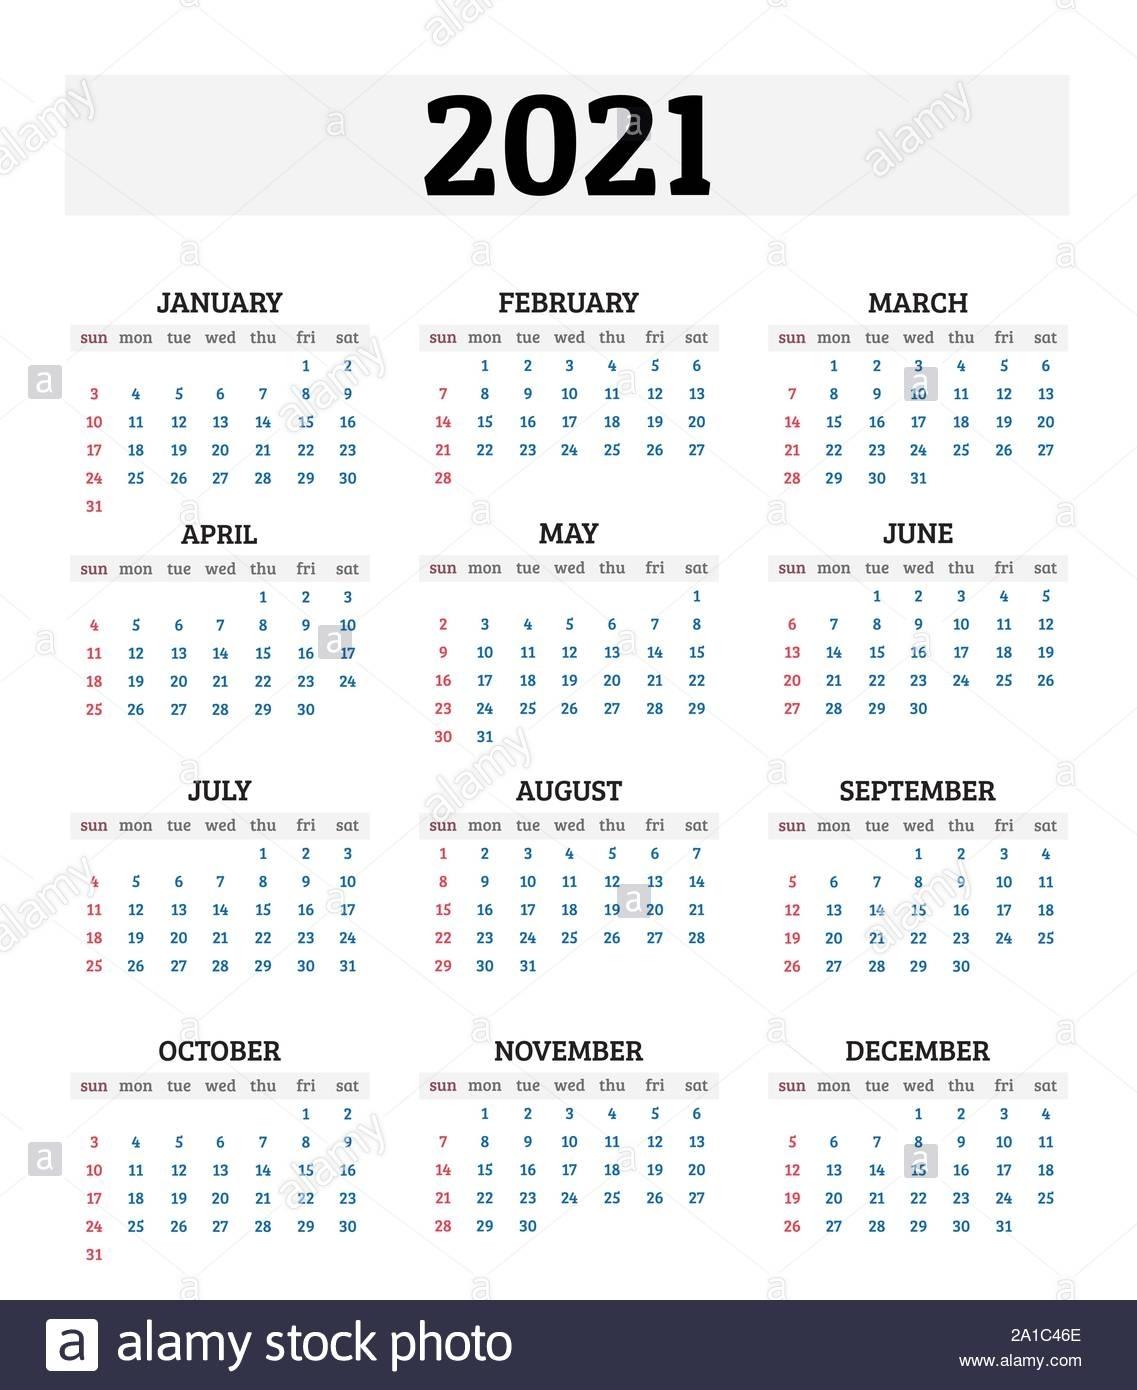 Collect 2021 Annual Calendar